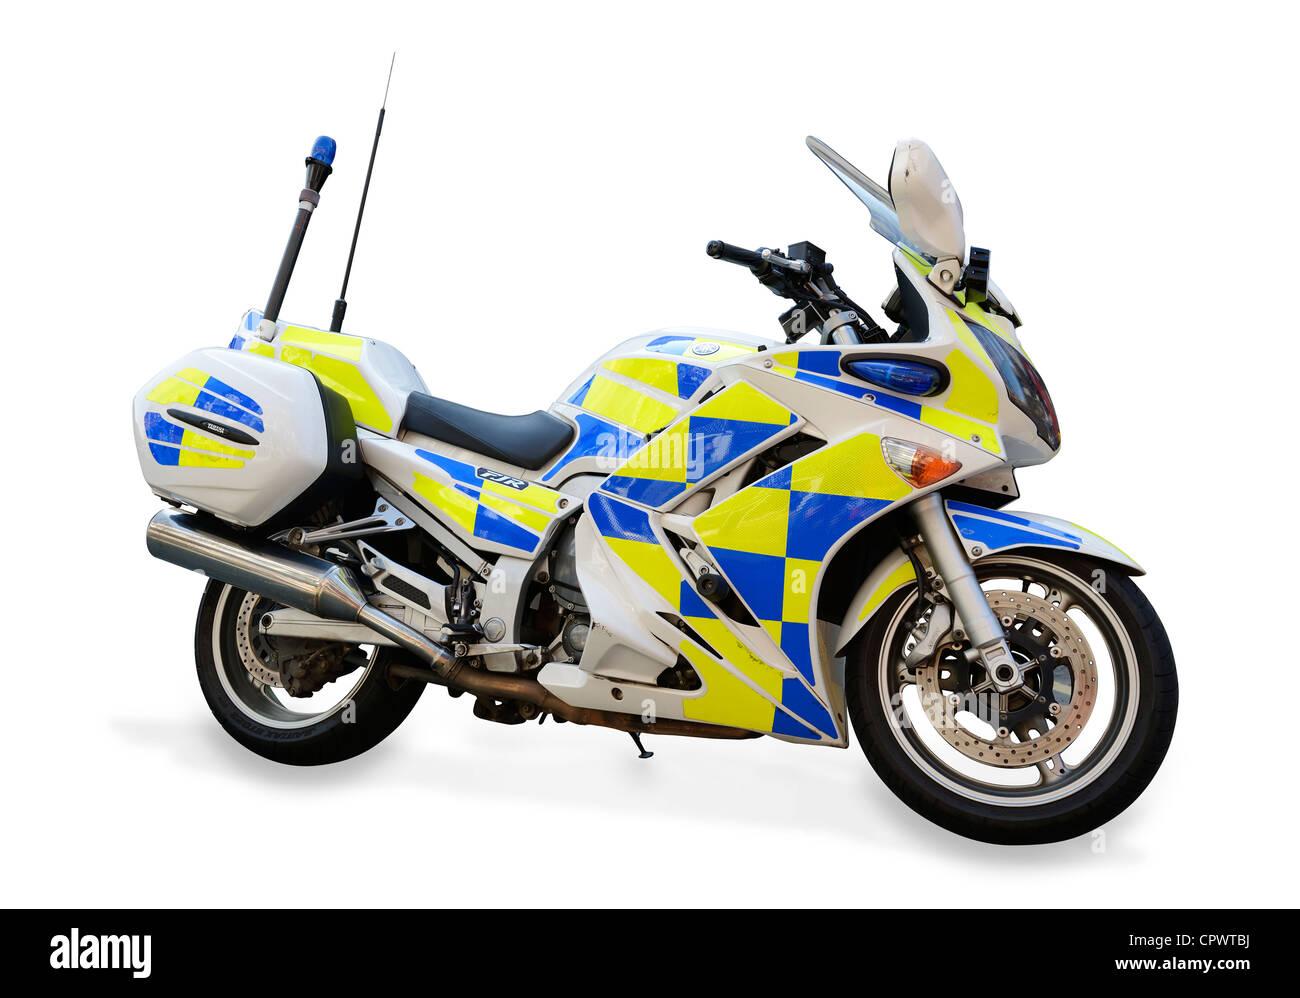 Police motorbike - Stock Image